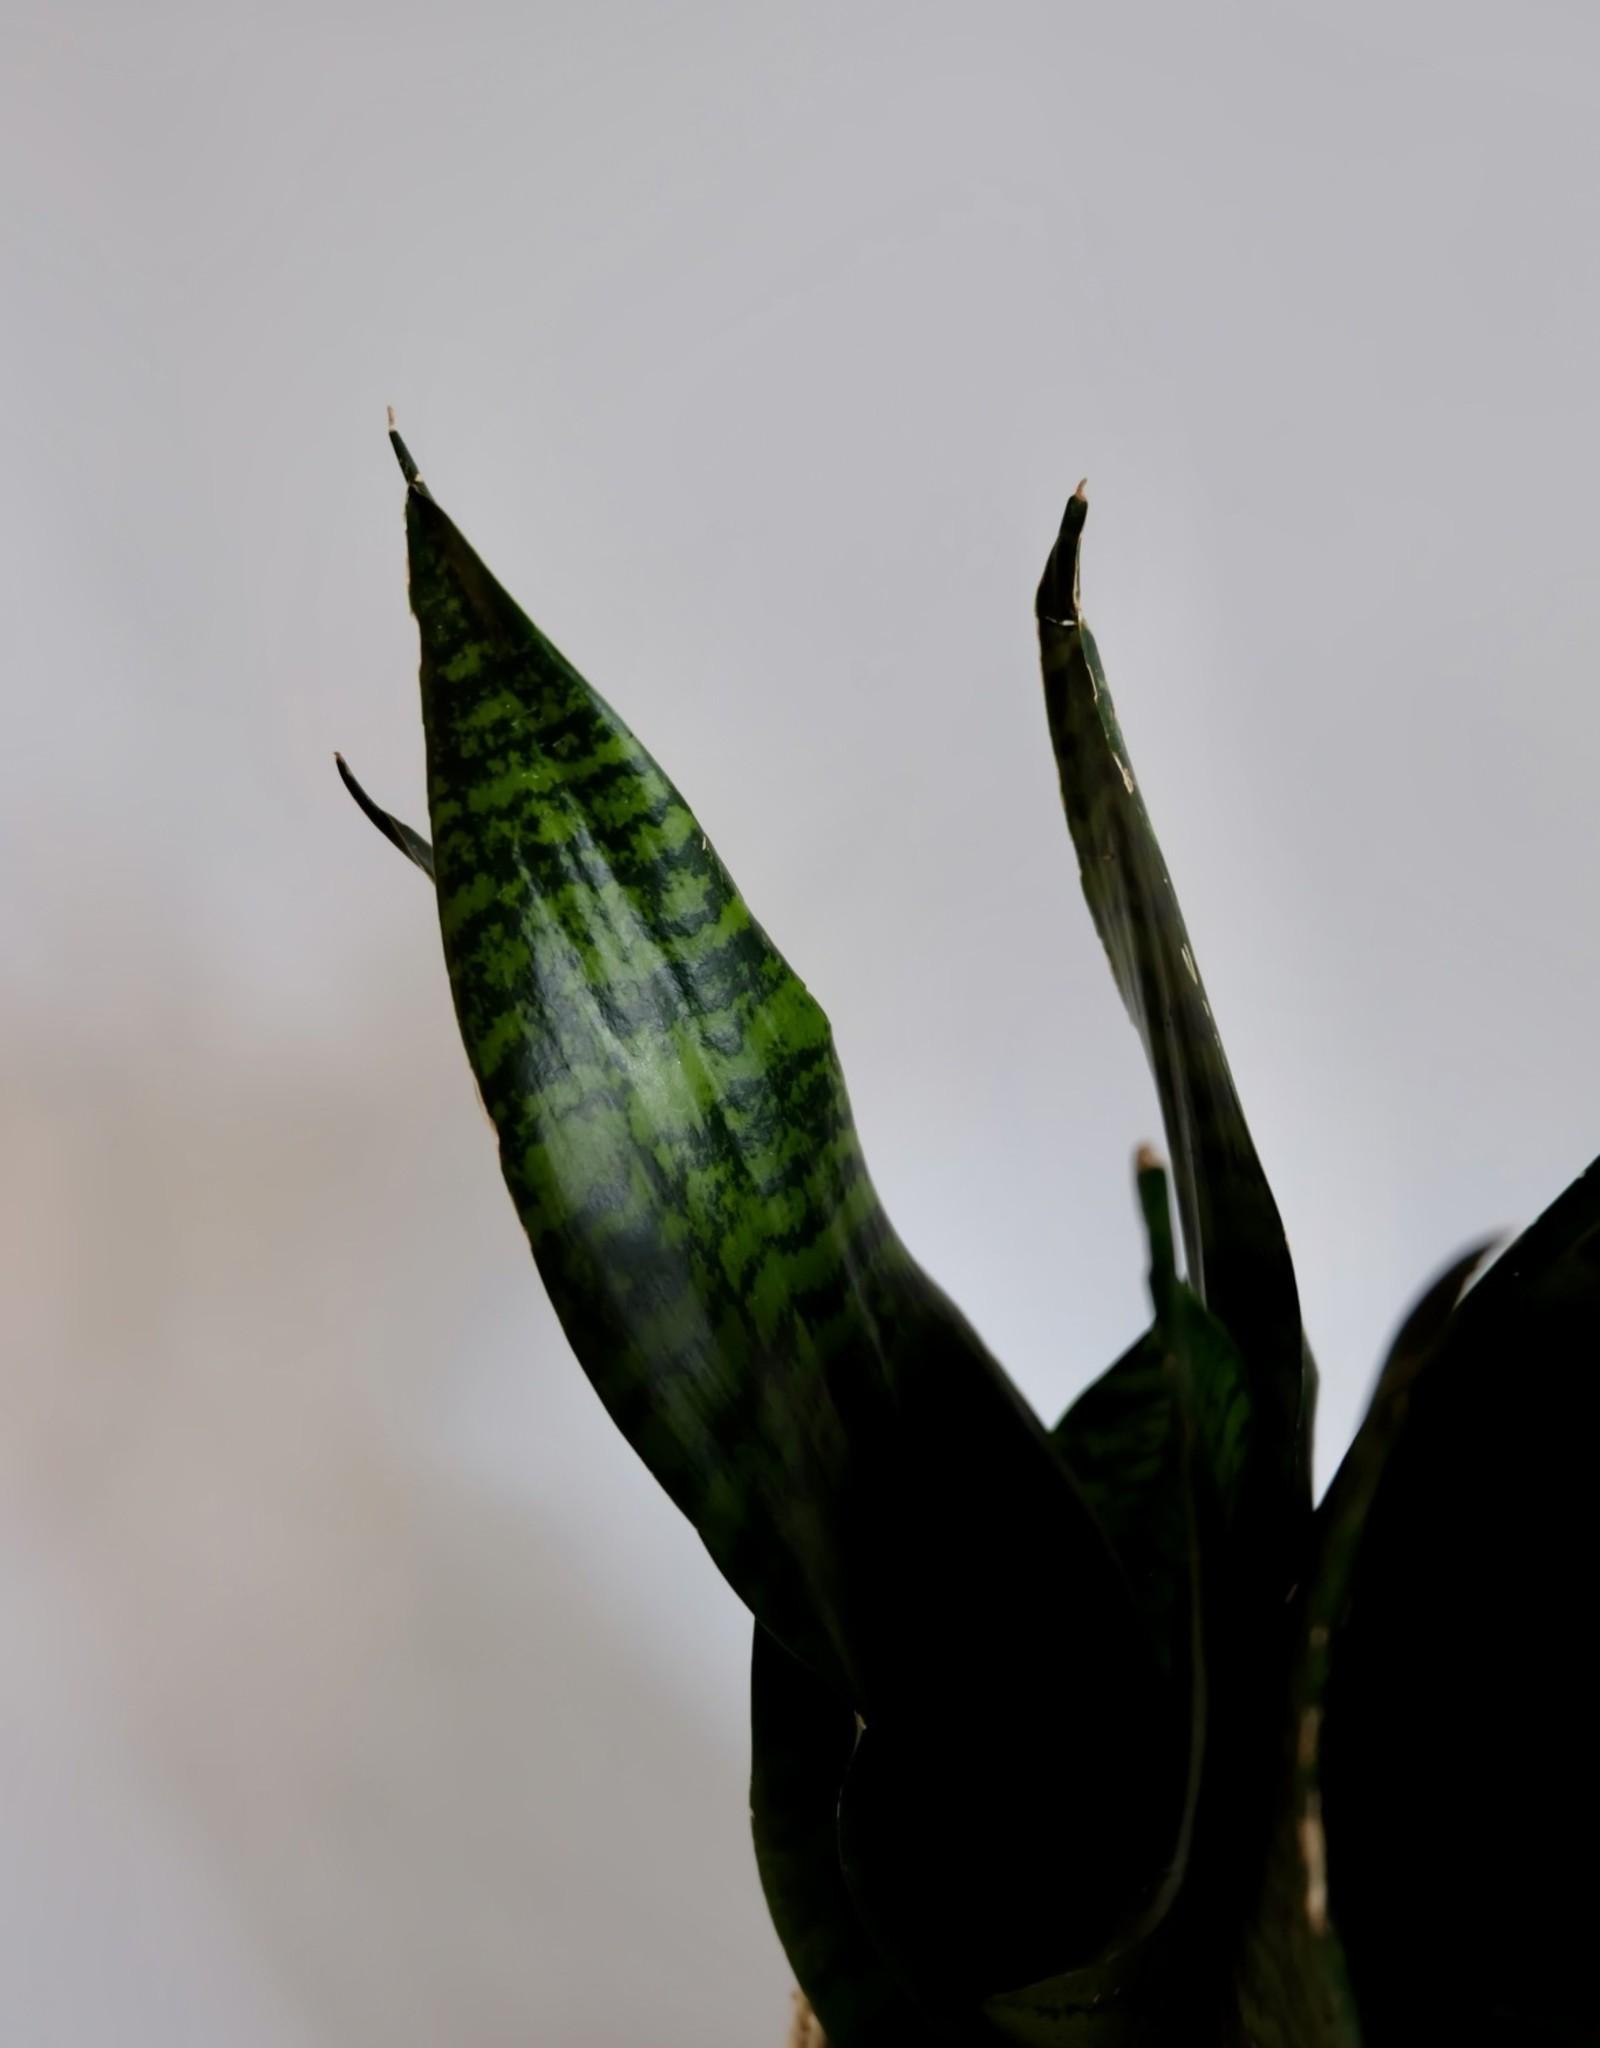 GRUUN Sansevieria trifasciata 'Super Green' Ø14 h45